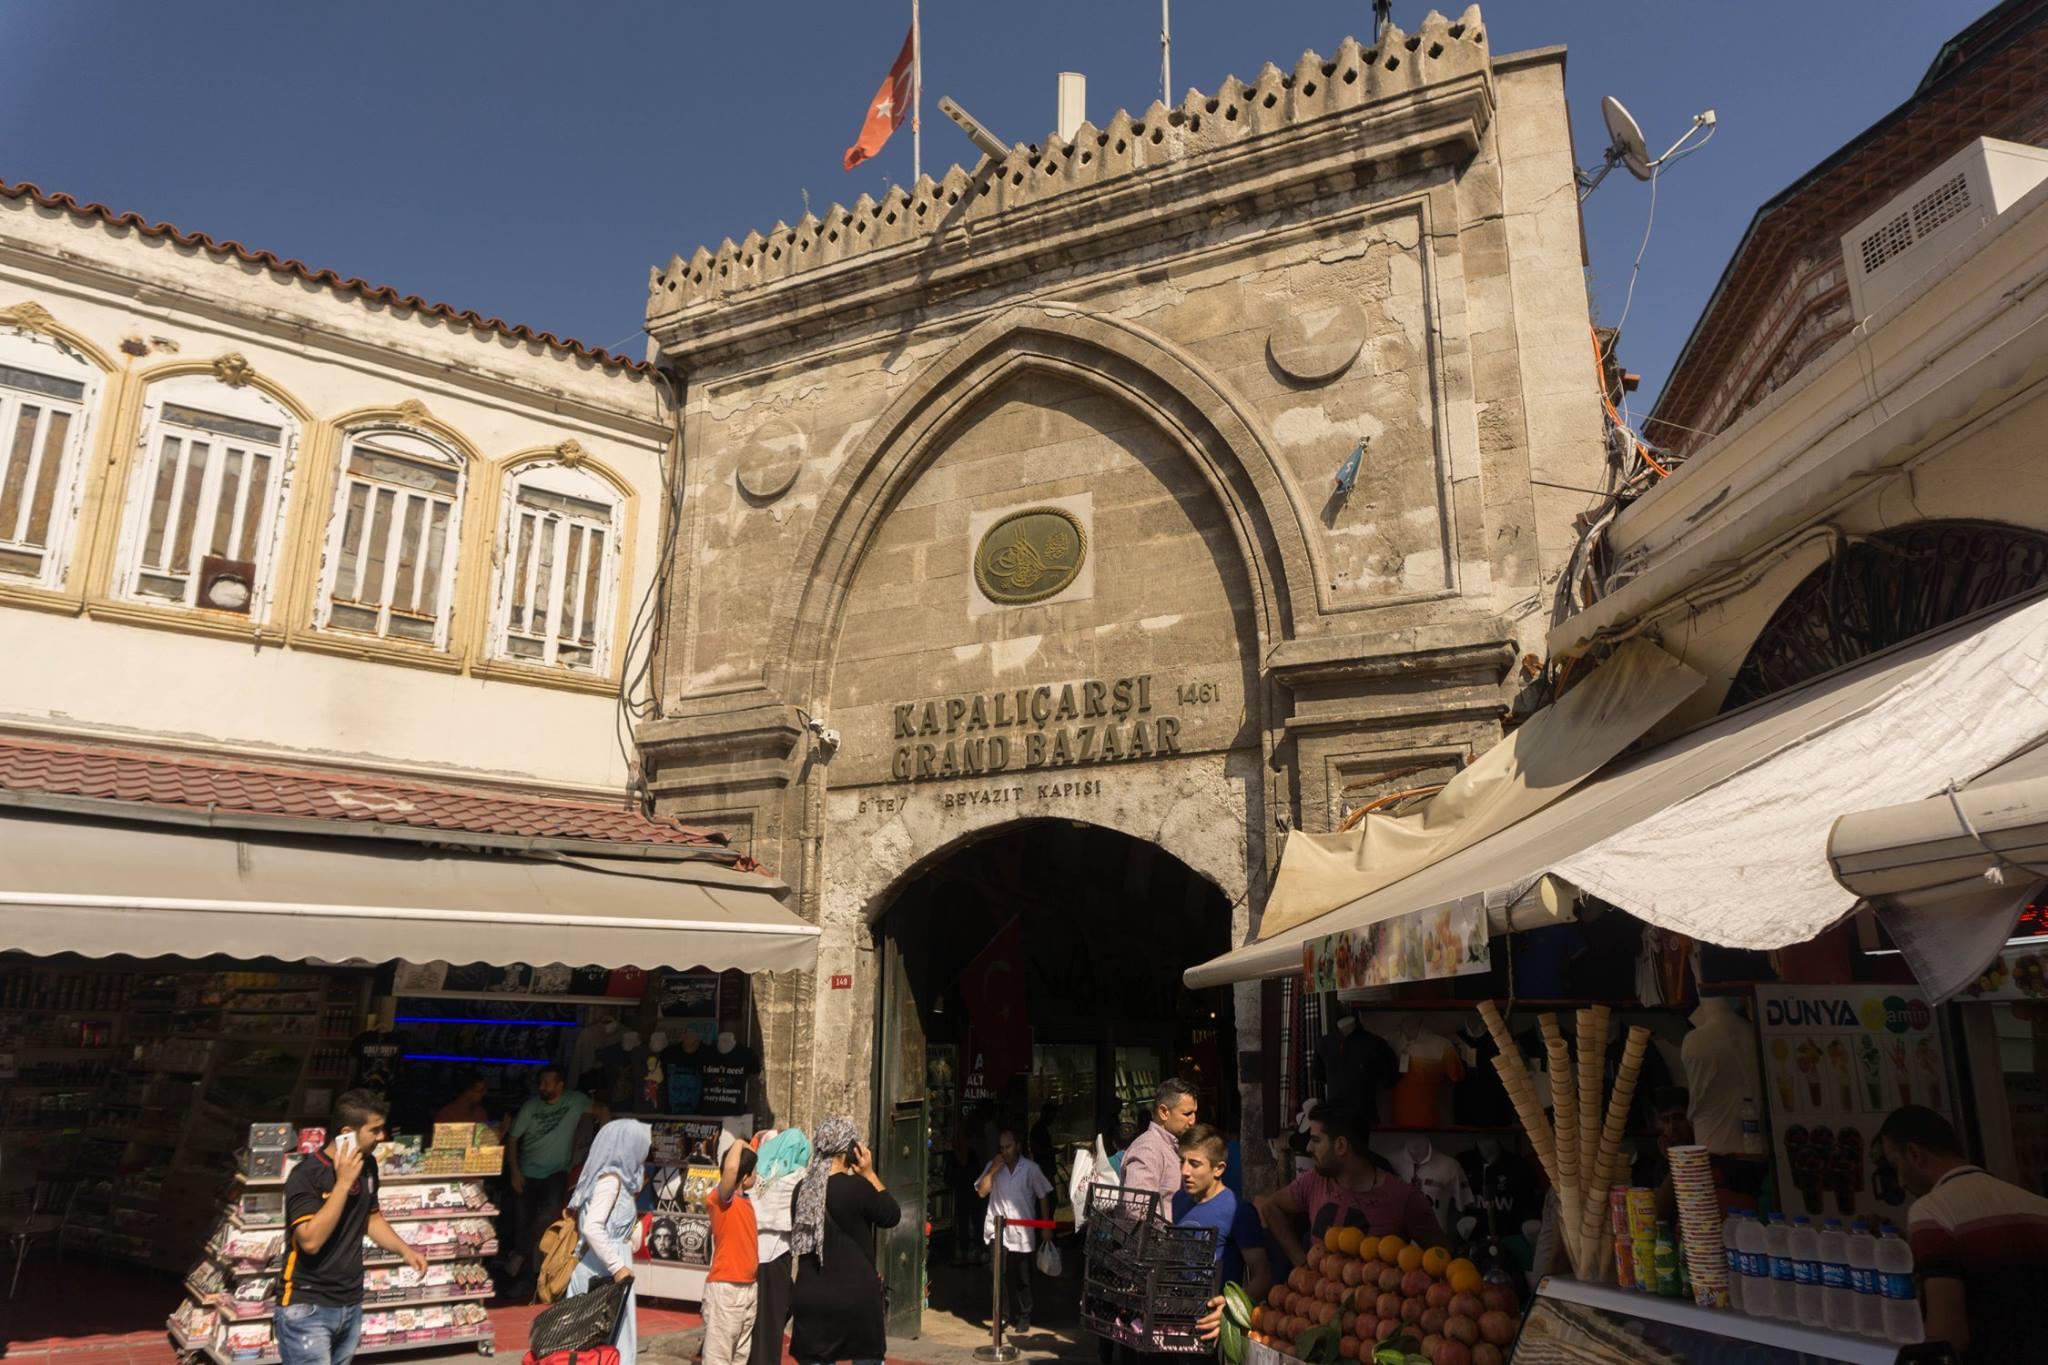 Beyazıt Entry of Grand Bazaar